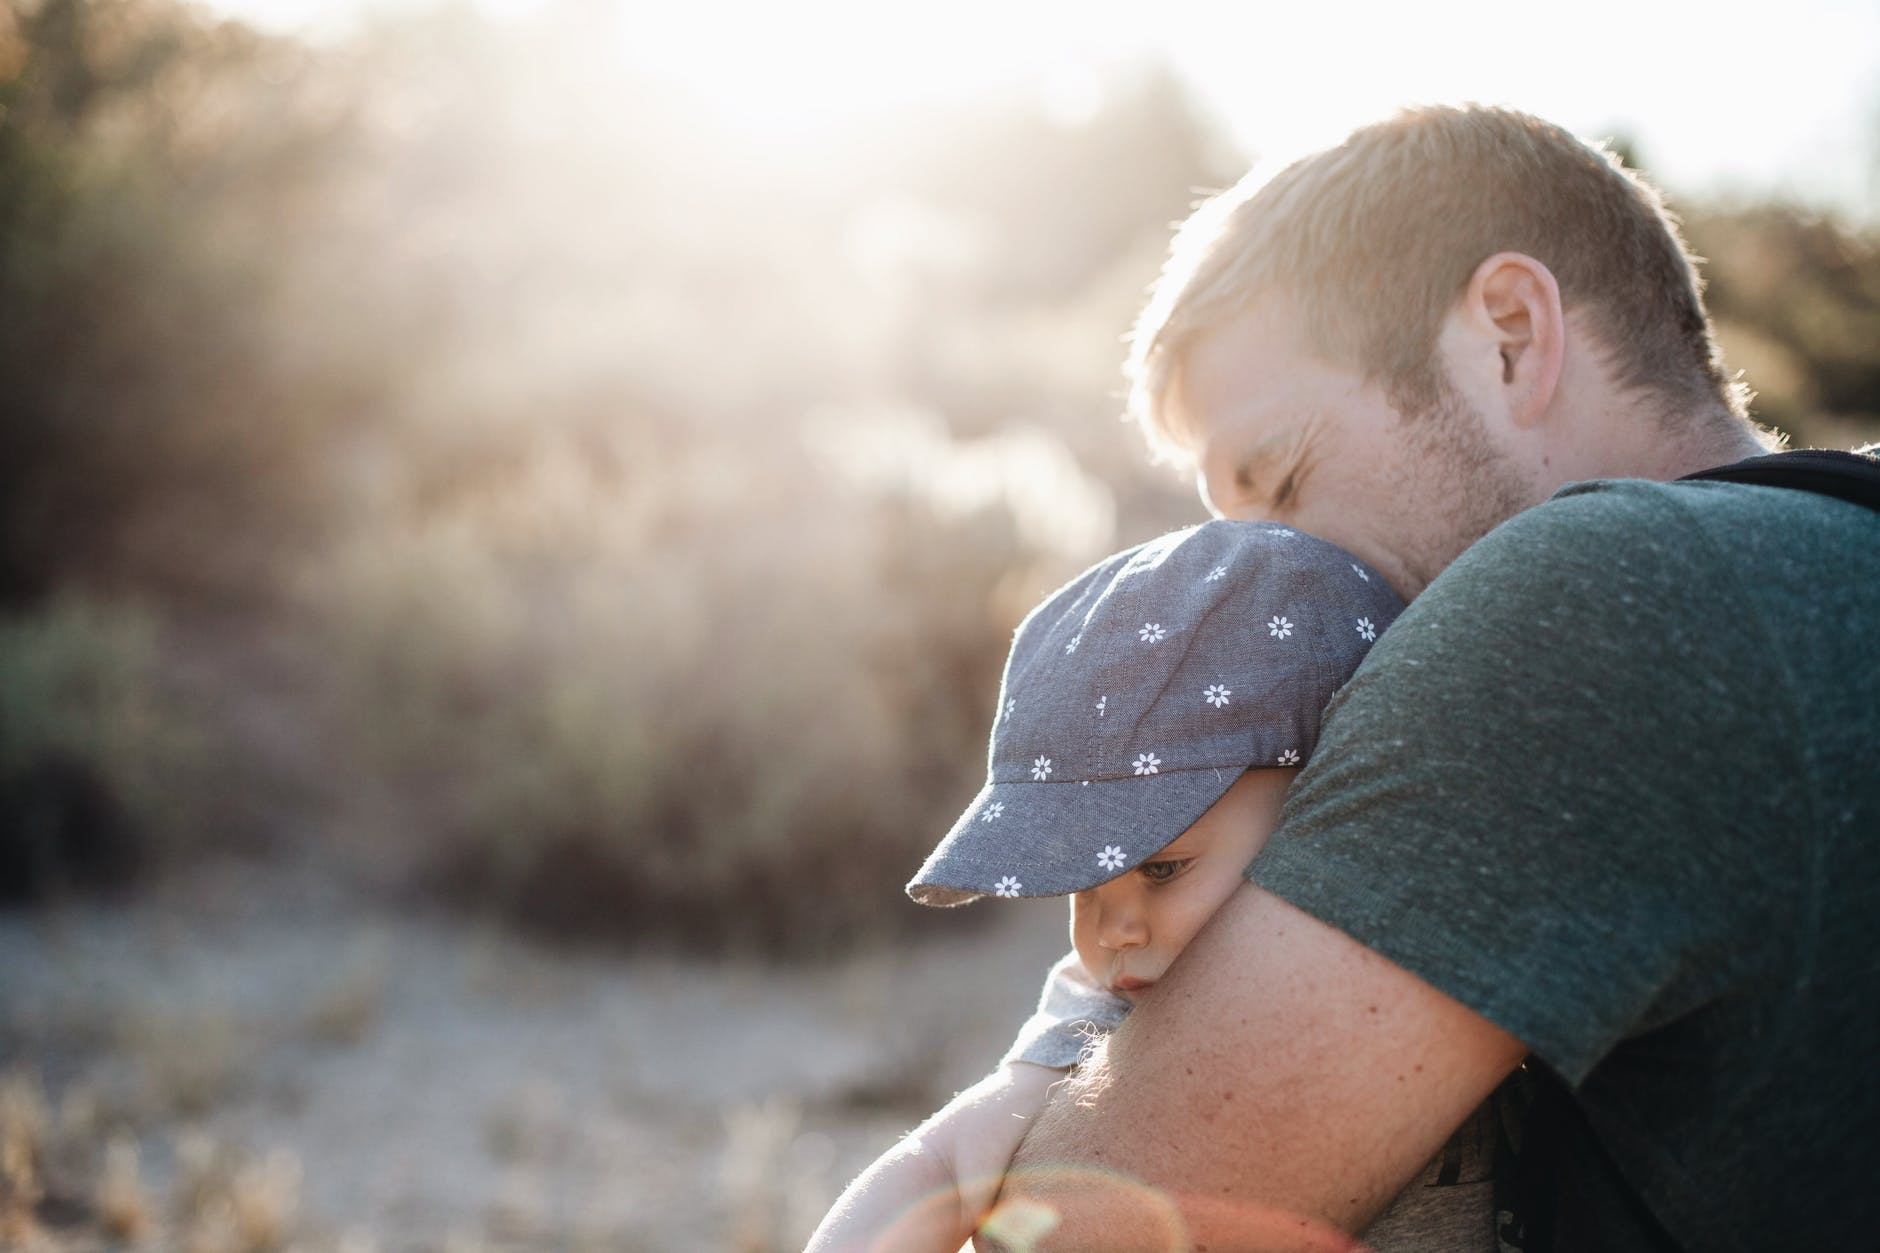 Может ли мужчина установить отцовство без ведома матери